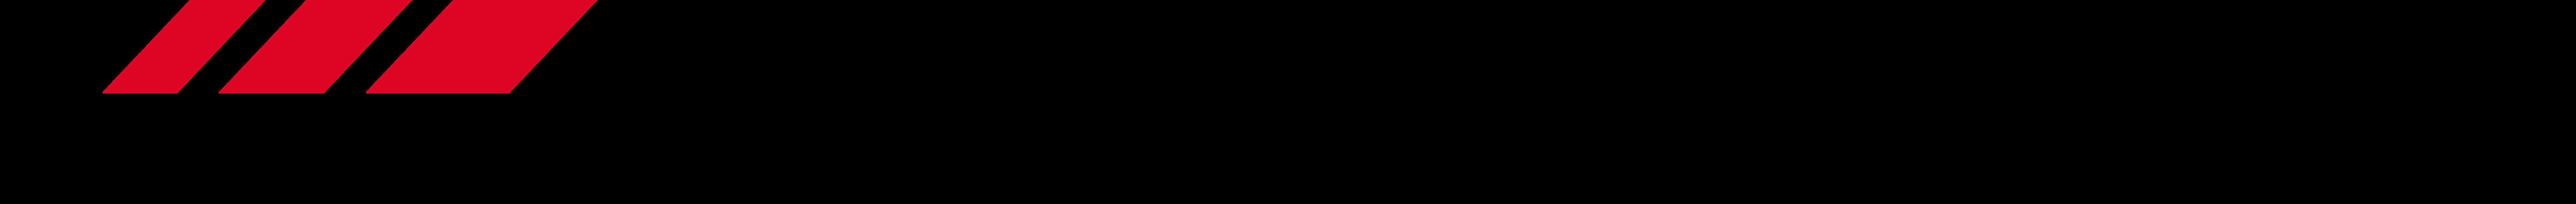 Bestellung stahlgruber